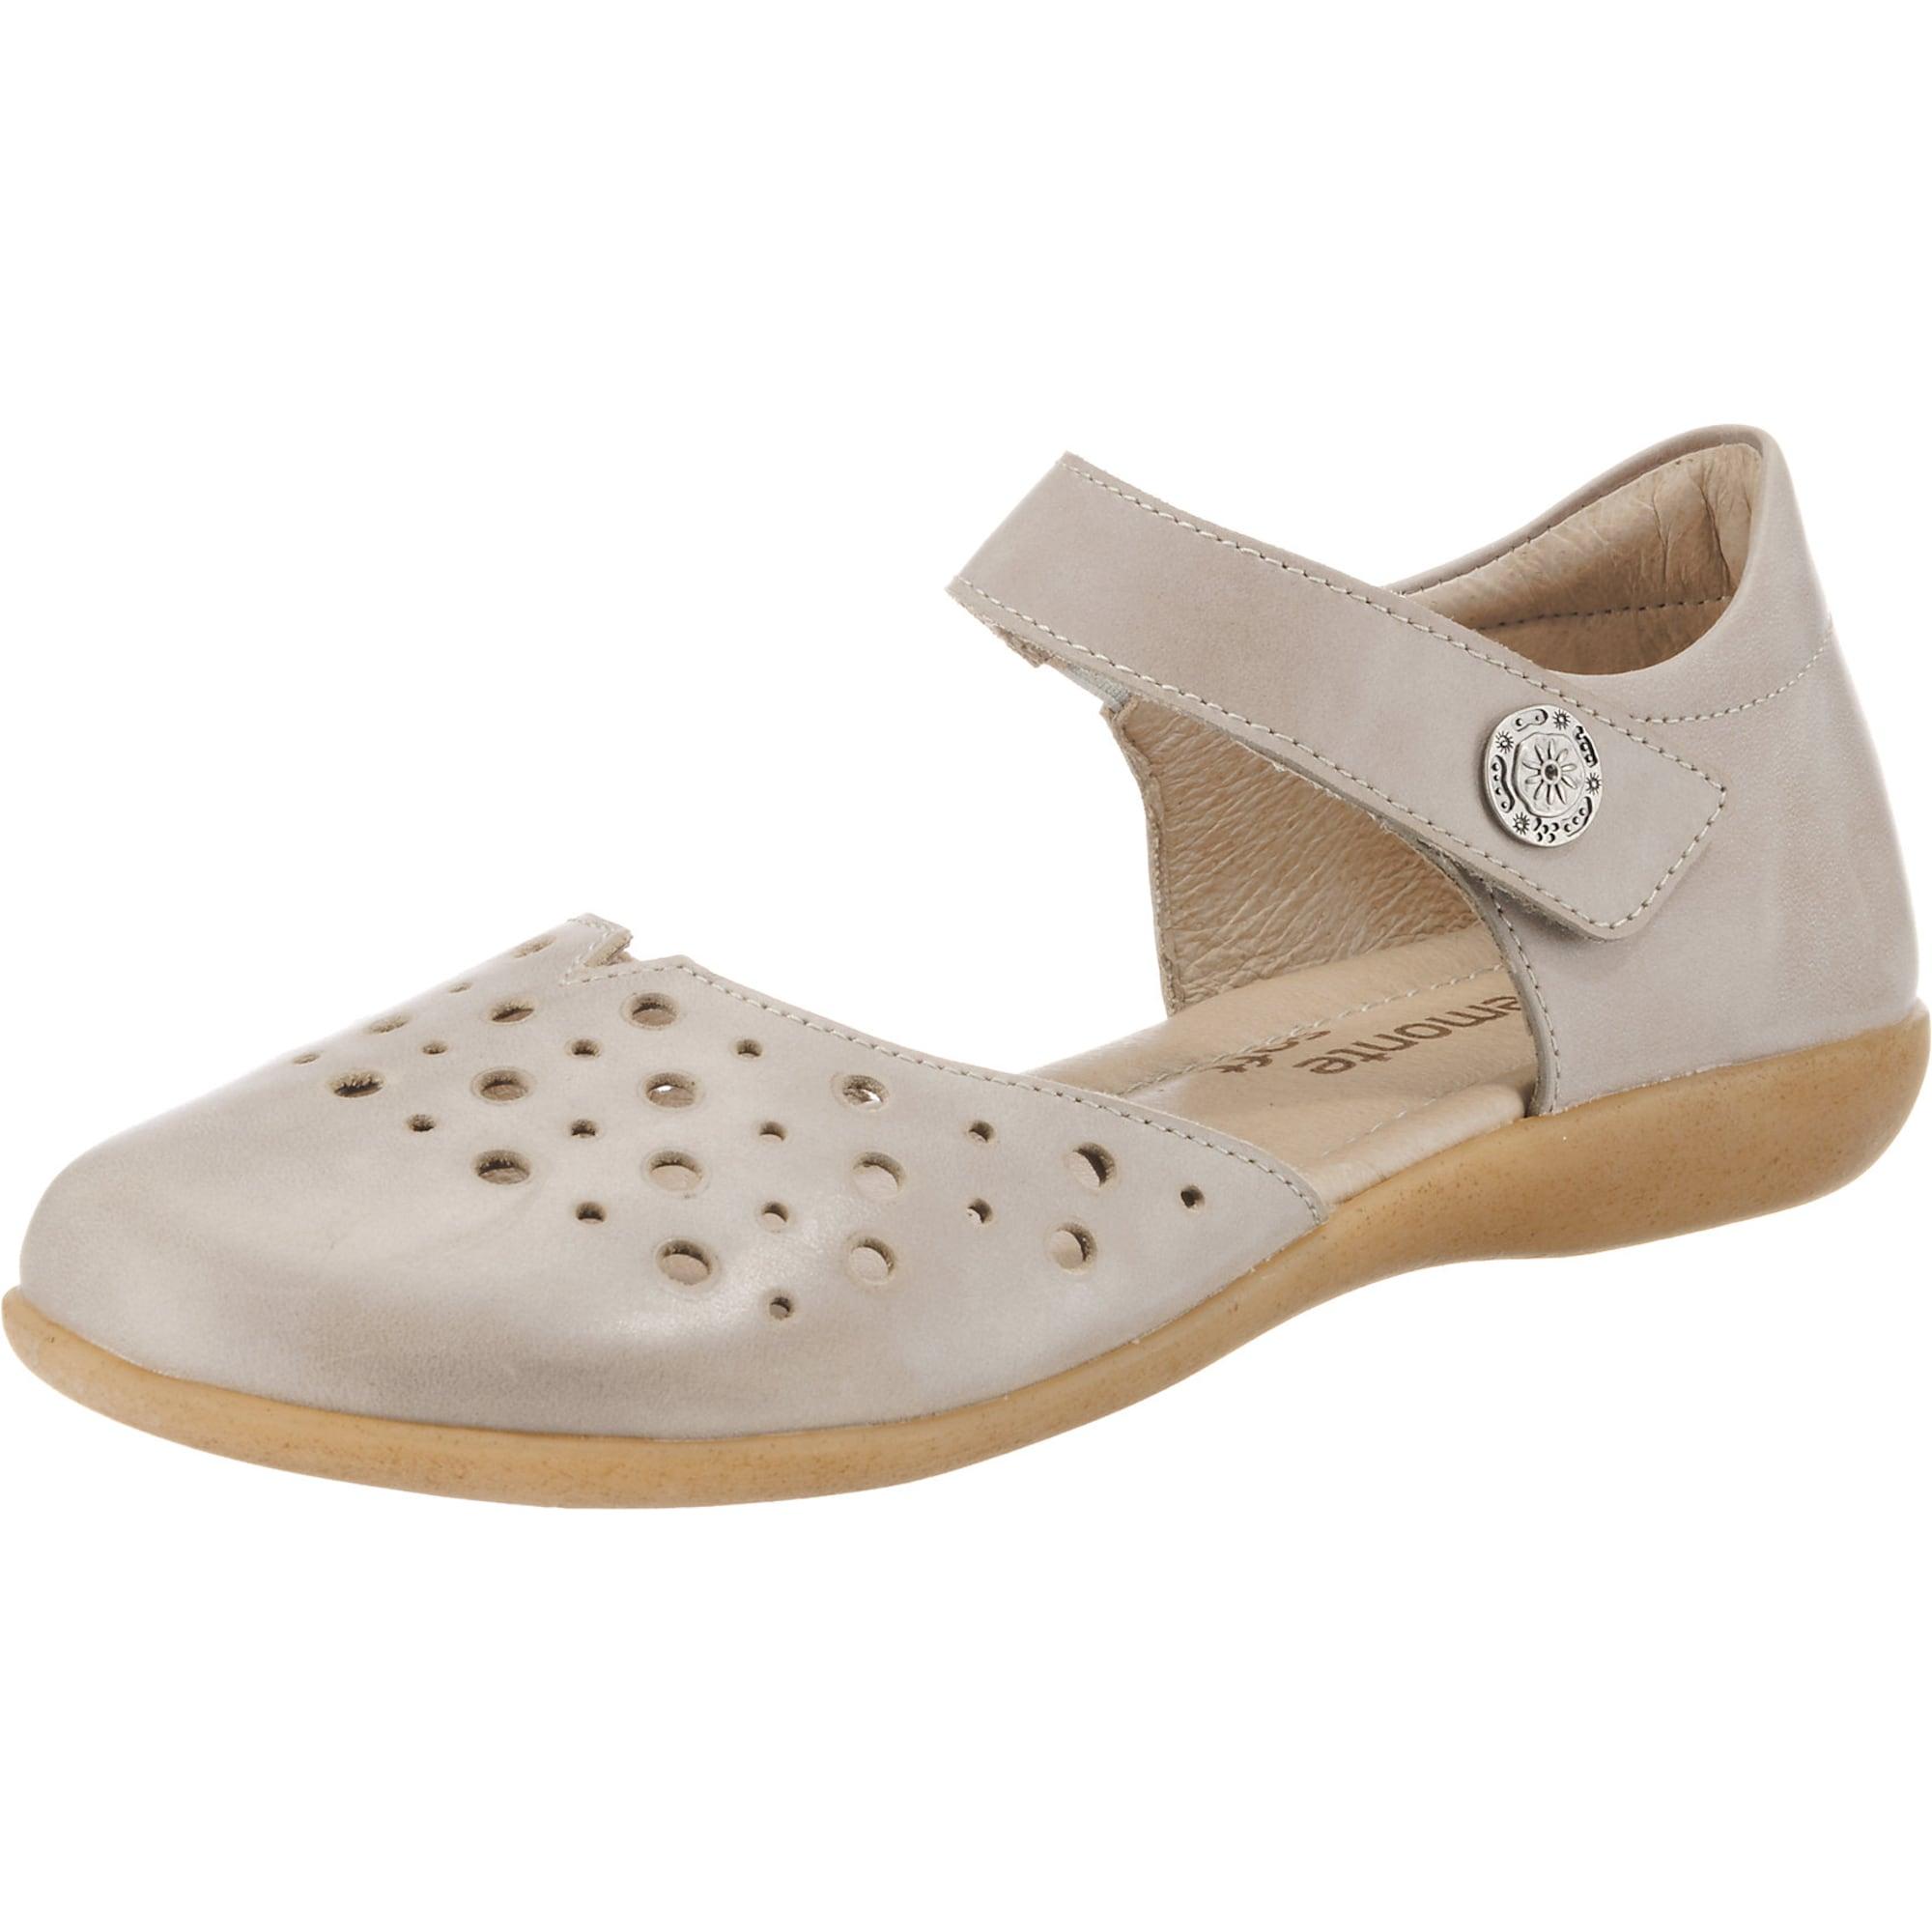 Riemchenballerinas | Schuhe > Ballerinas > Riemchenballerinas | Remonte